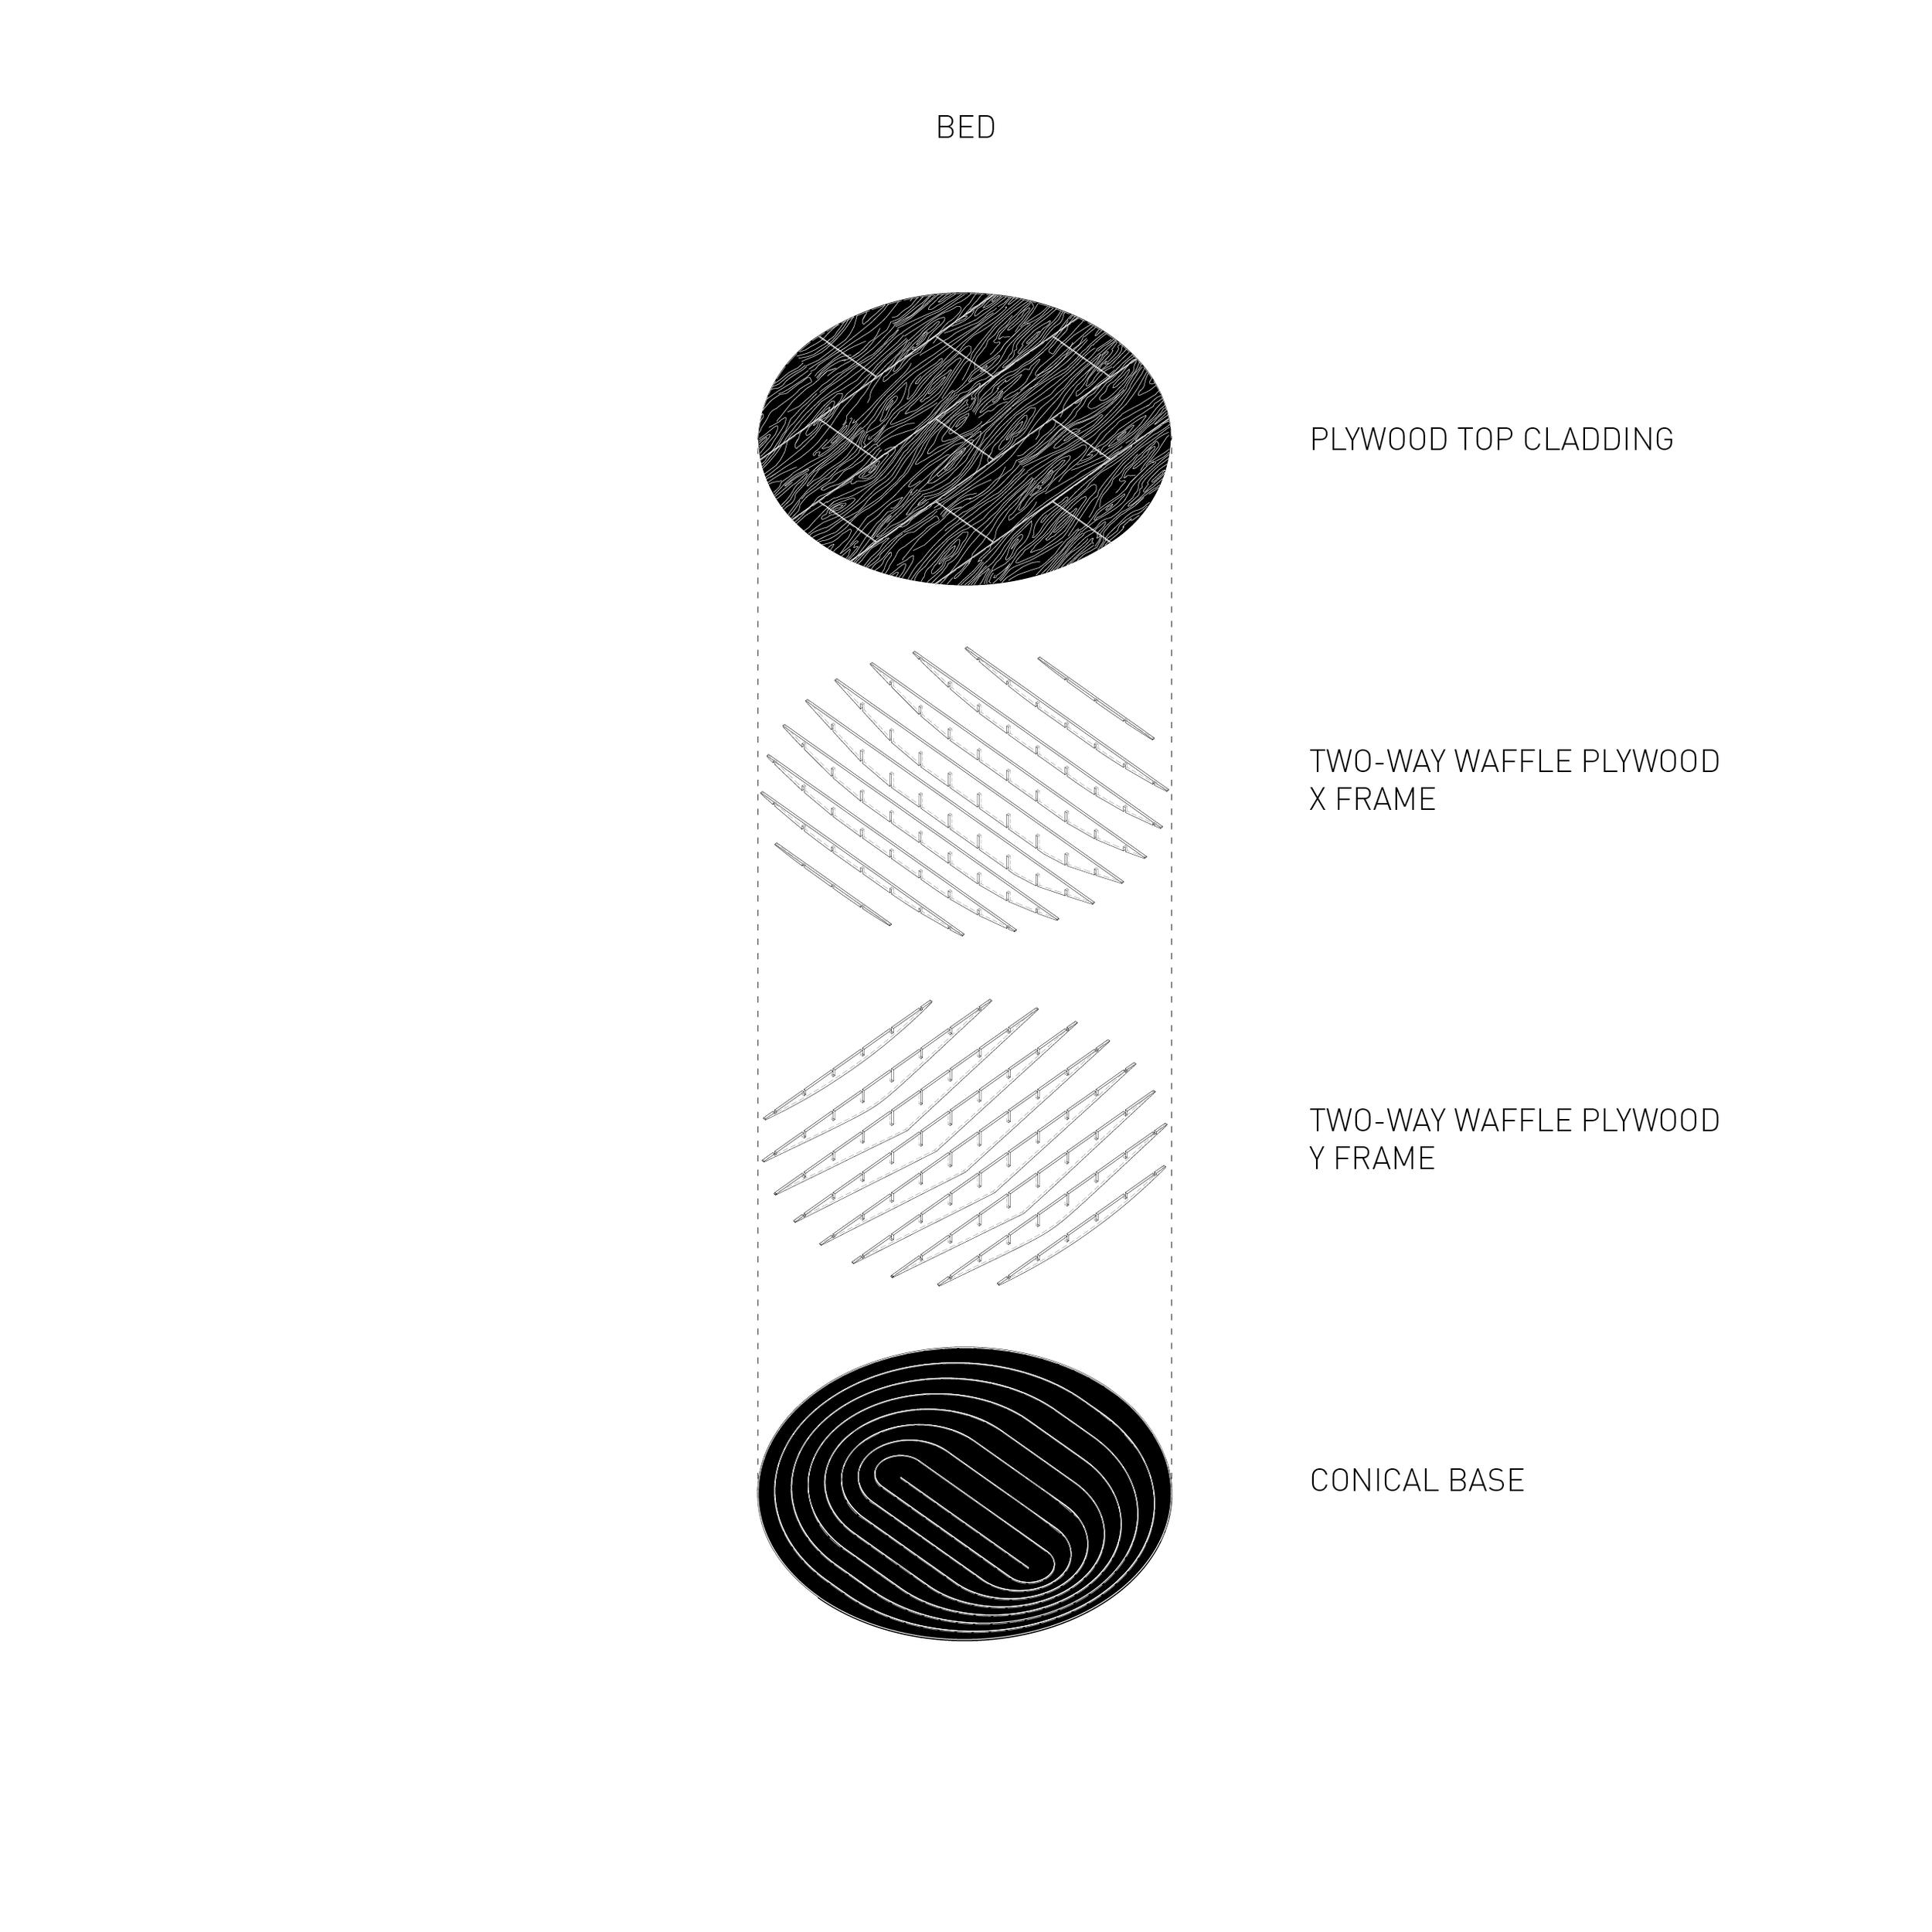 2019_Ragdale Ring_Web Material8.png